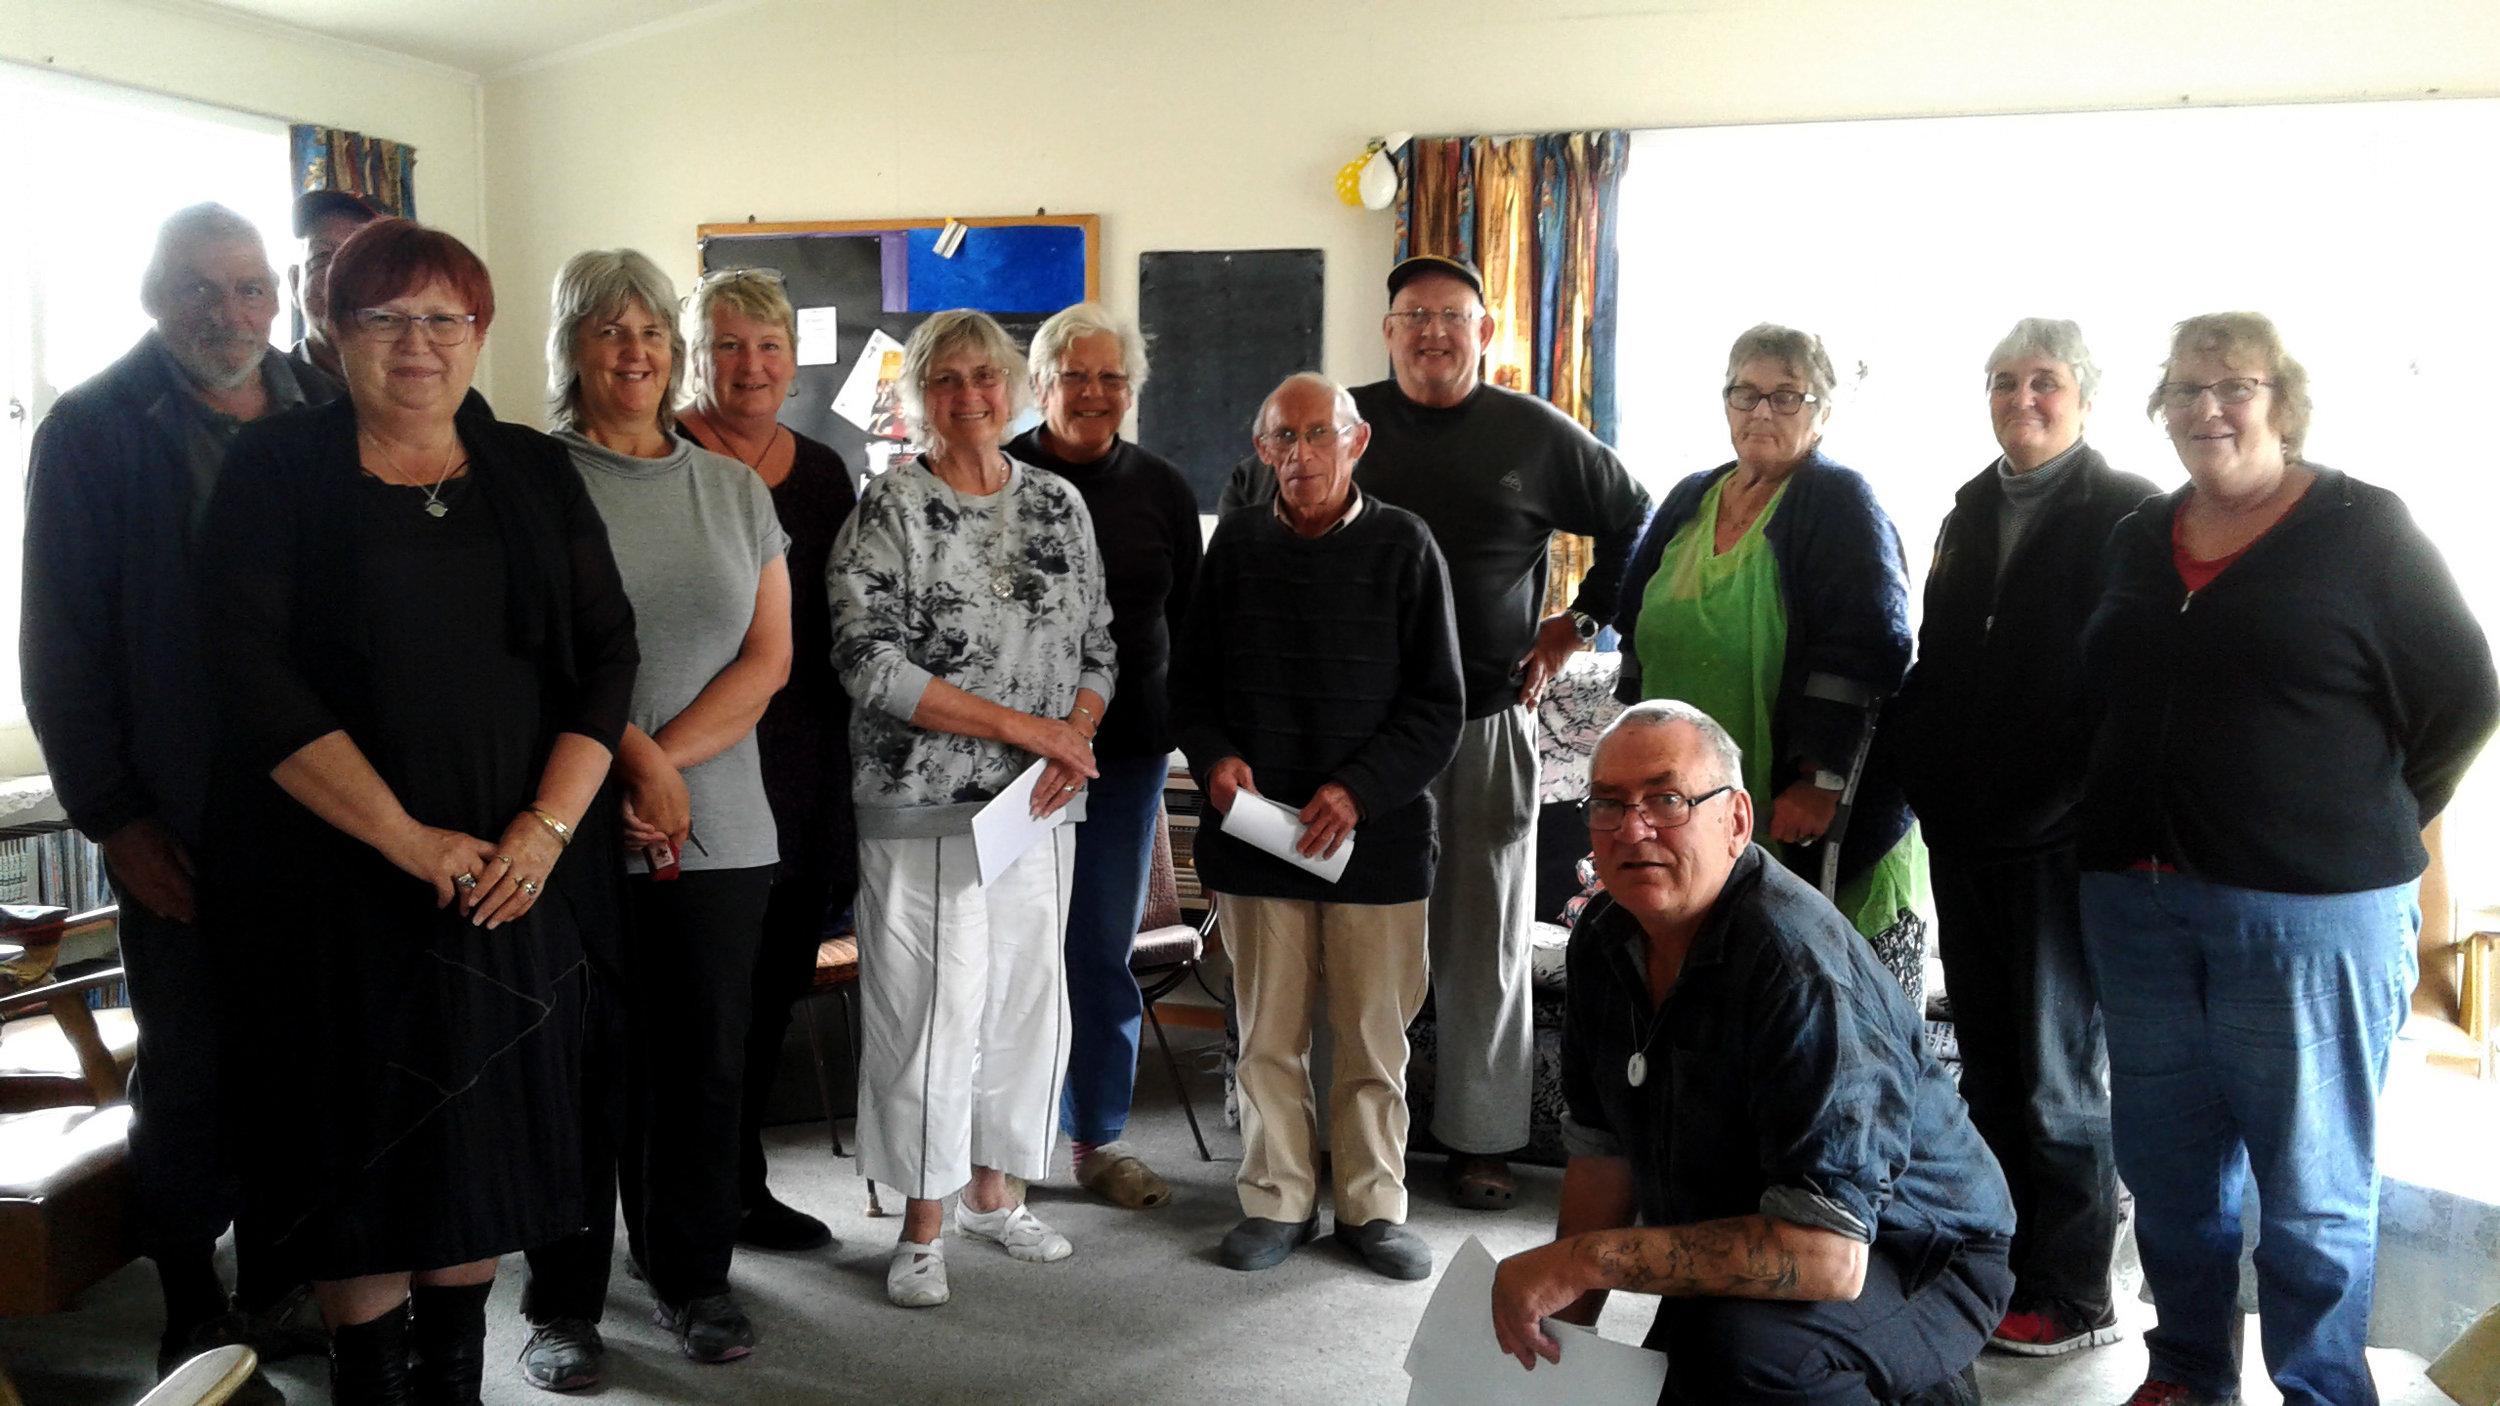 Budgeting advice from Robin Parks, Te Korowai Trust